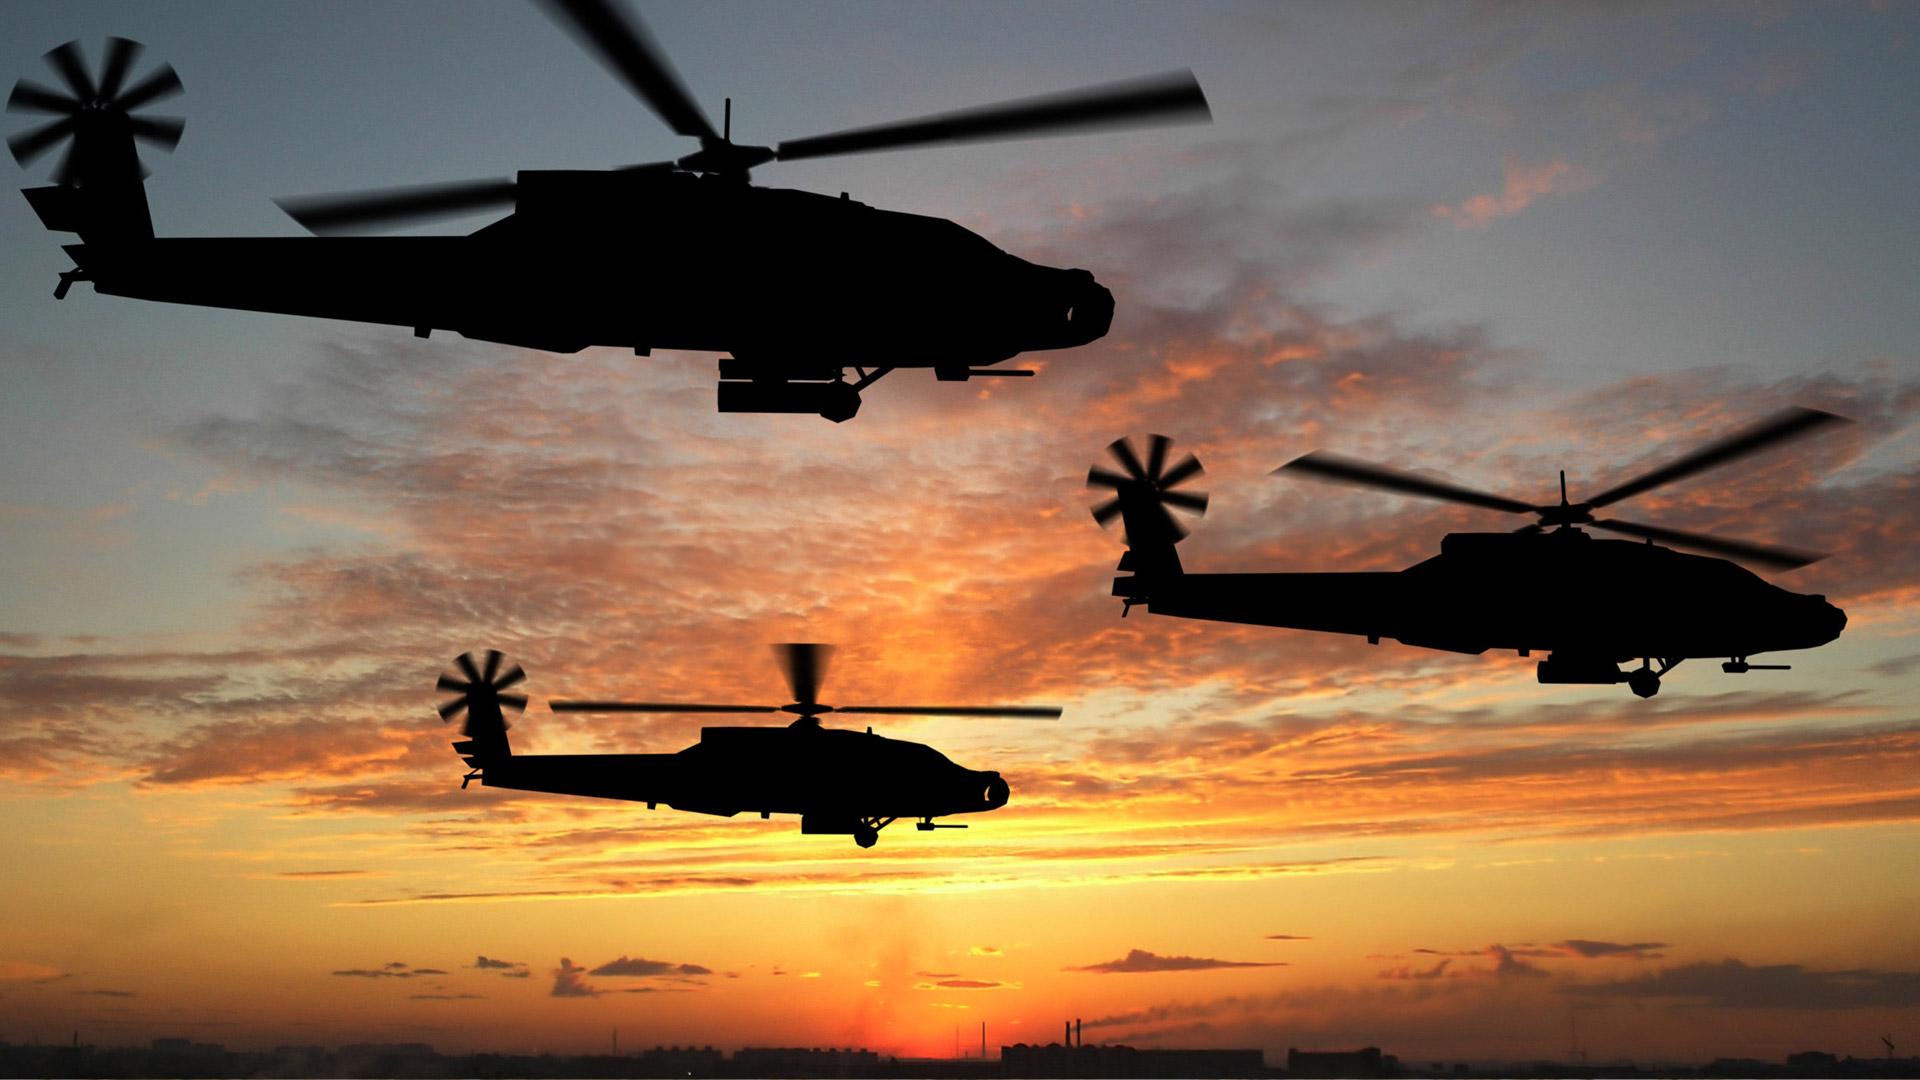 civitanavi-systems-slideshow-airborne